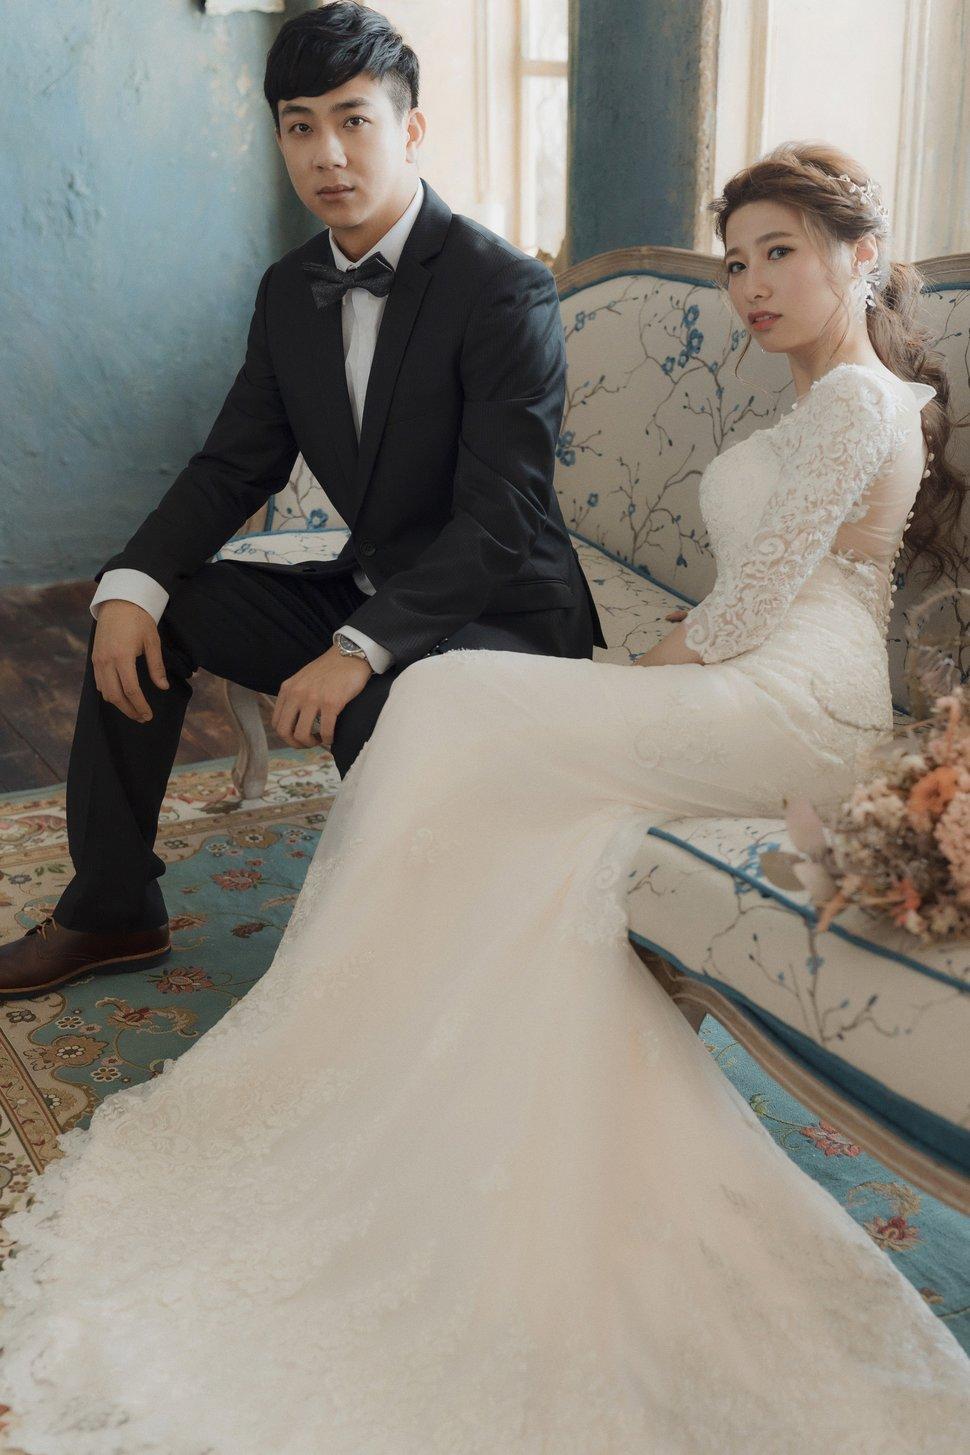 Khalil Chou(個性雜誌)-137 - Khalil Chou (凱勒·周)《結婚吧》